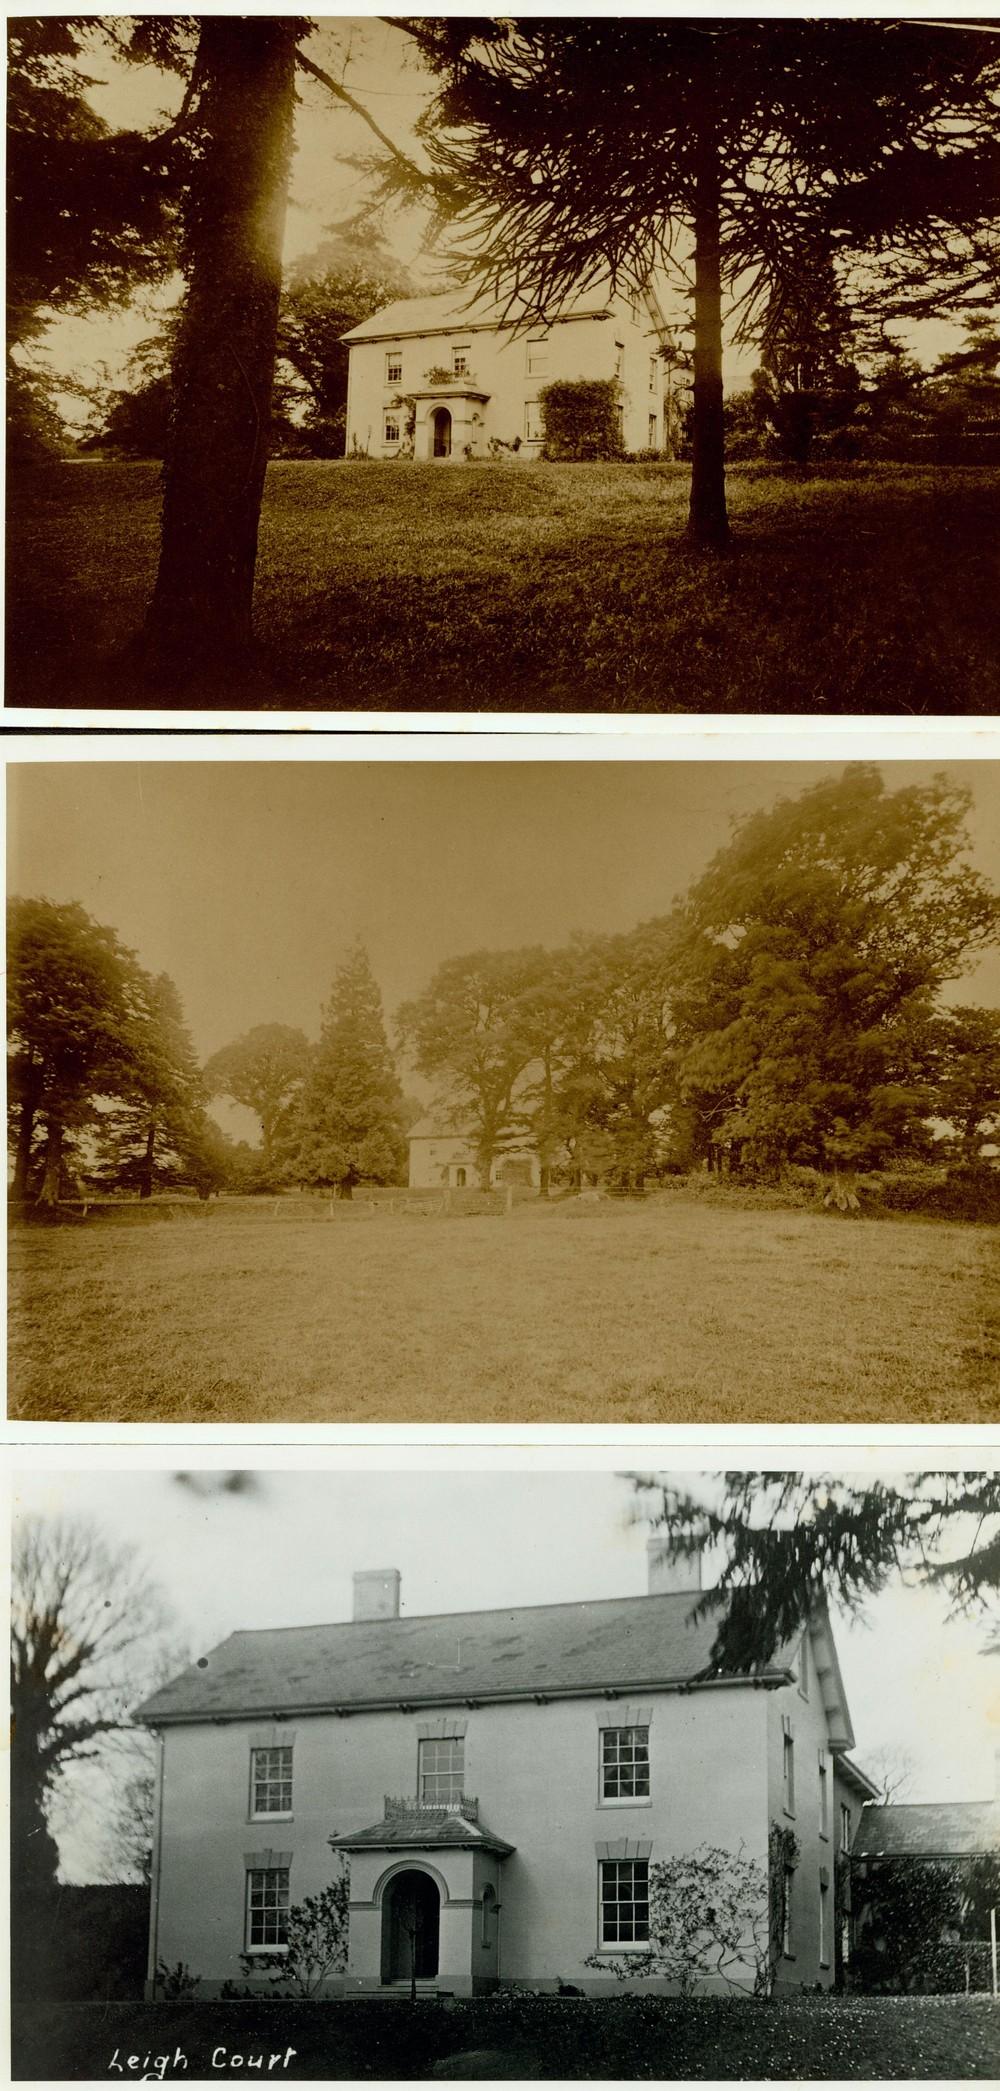 Leigh Court, Ashill, prior to 1920.-1